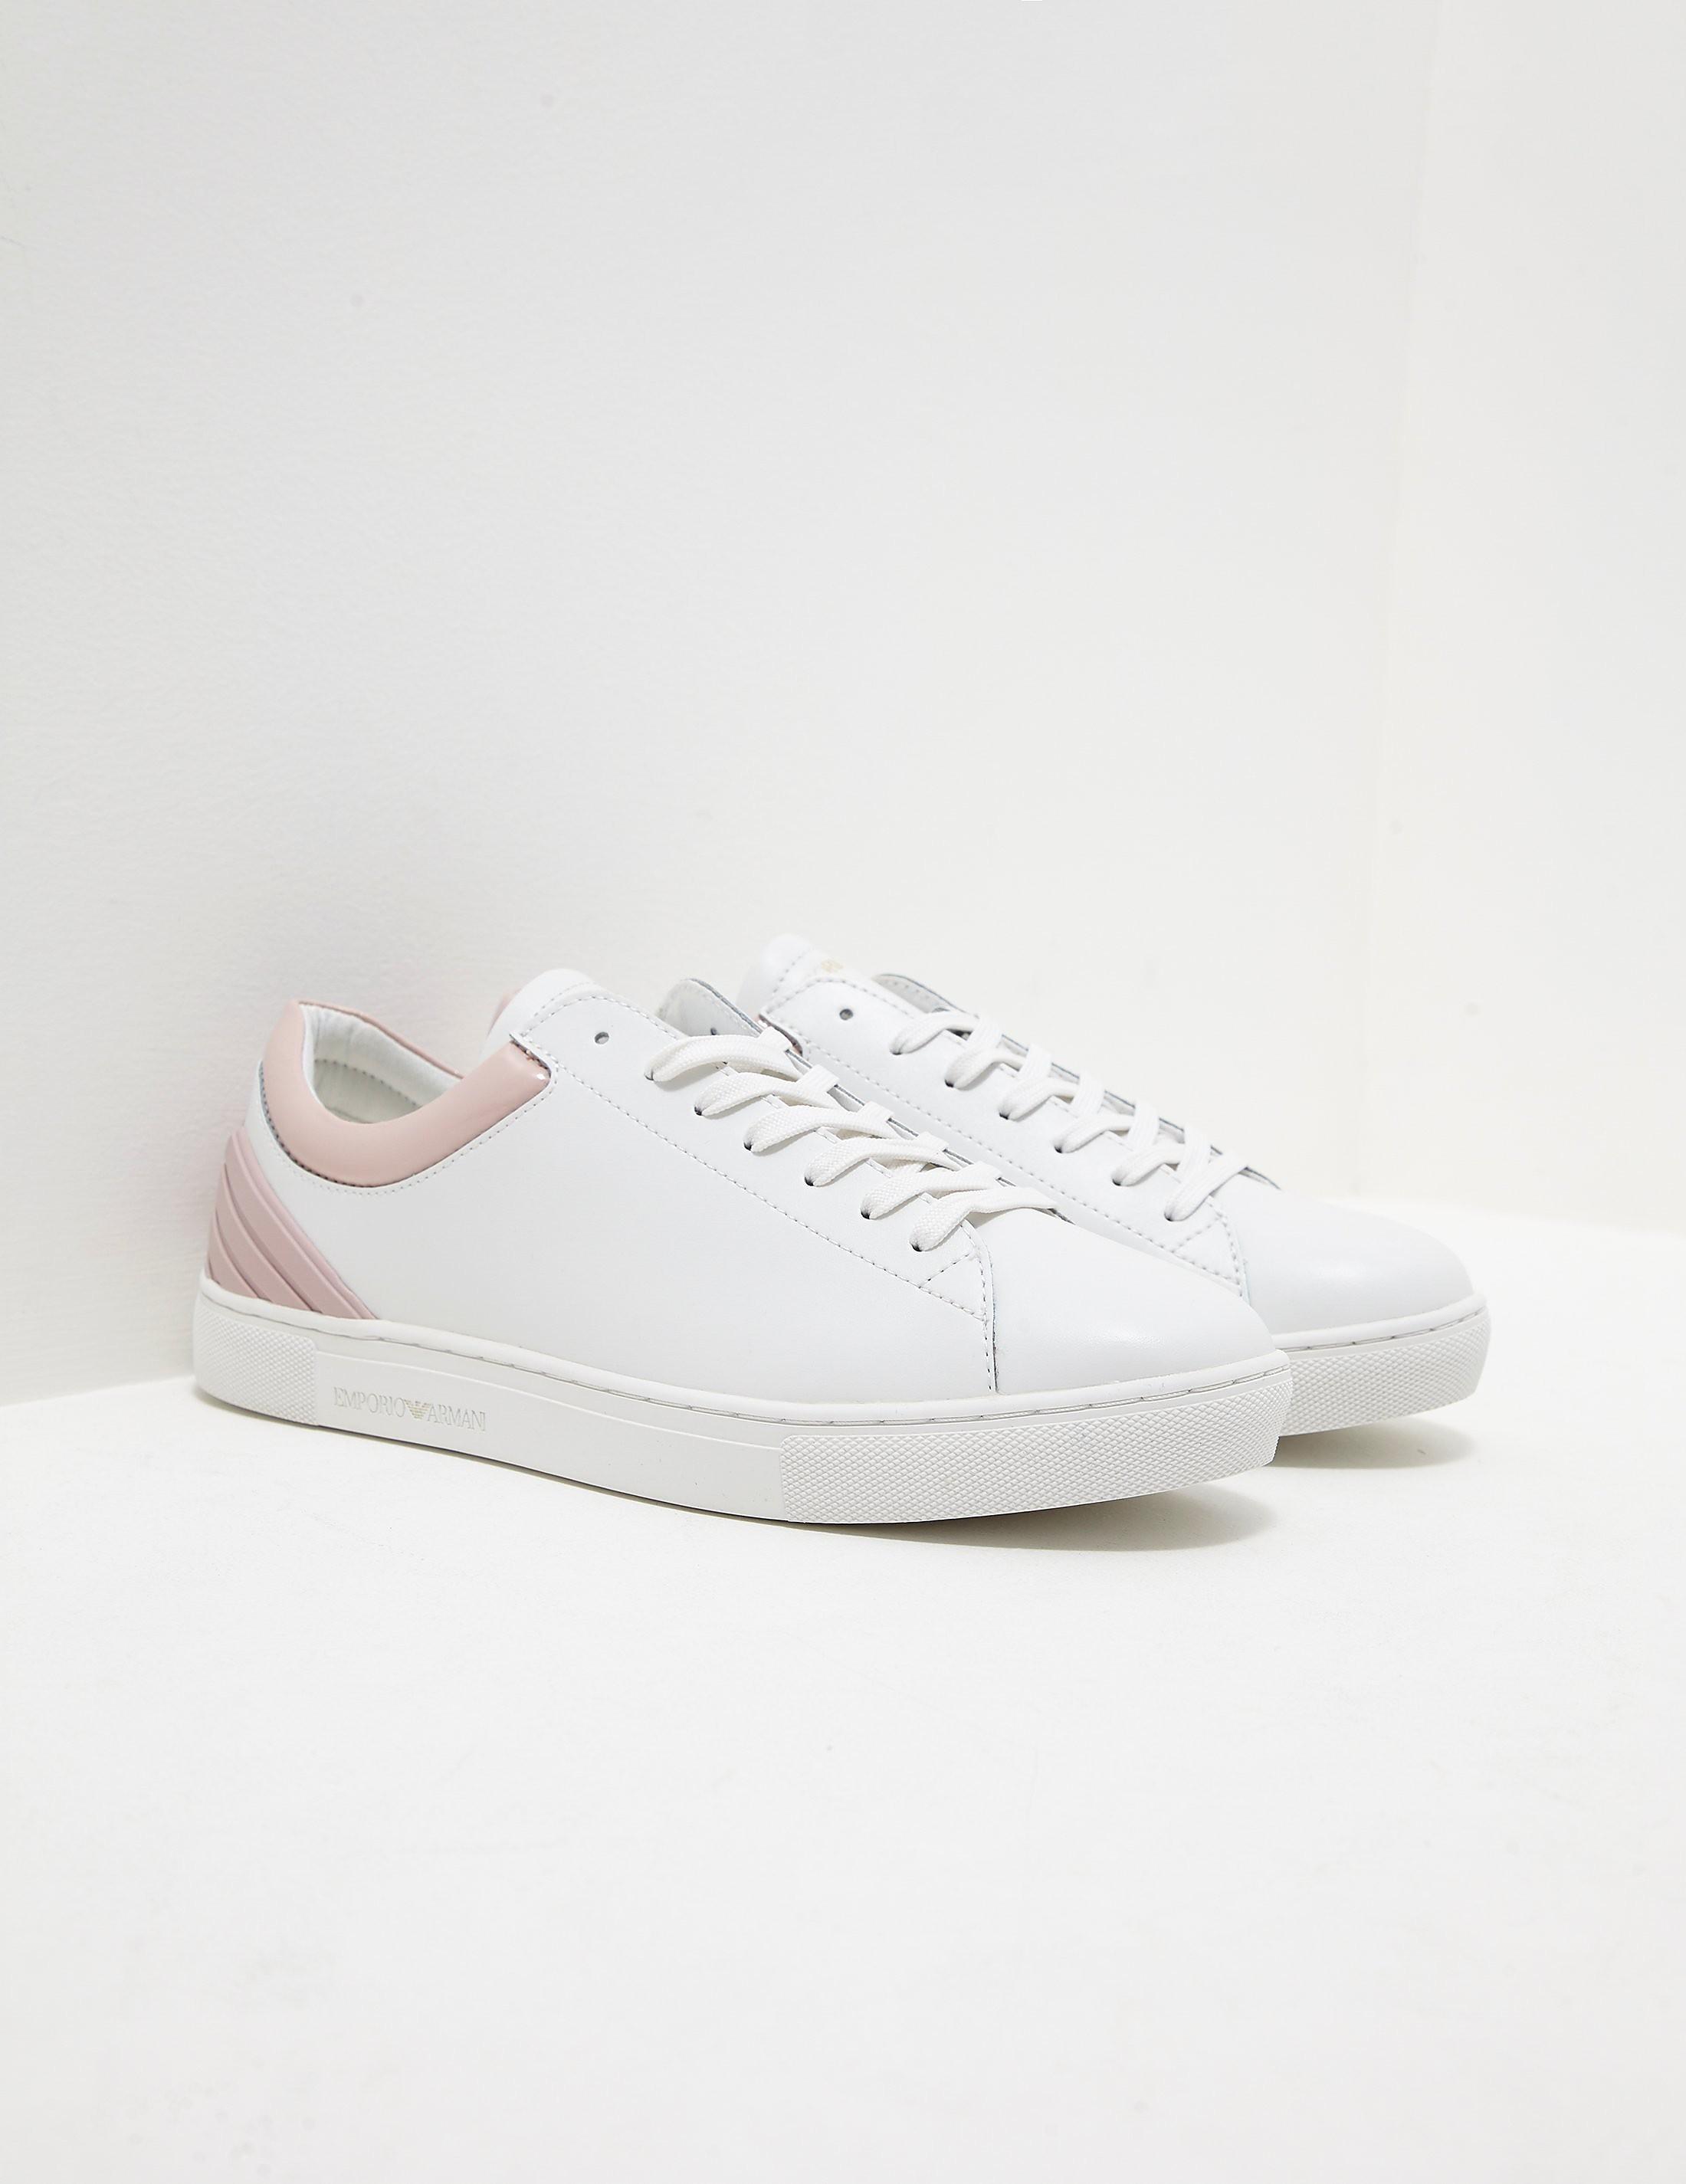 Emporio Armani Alana Sneakers